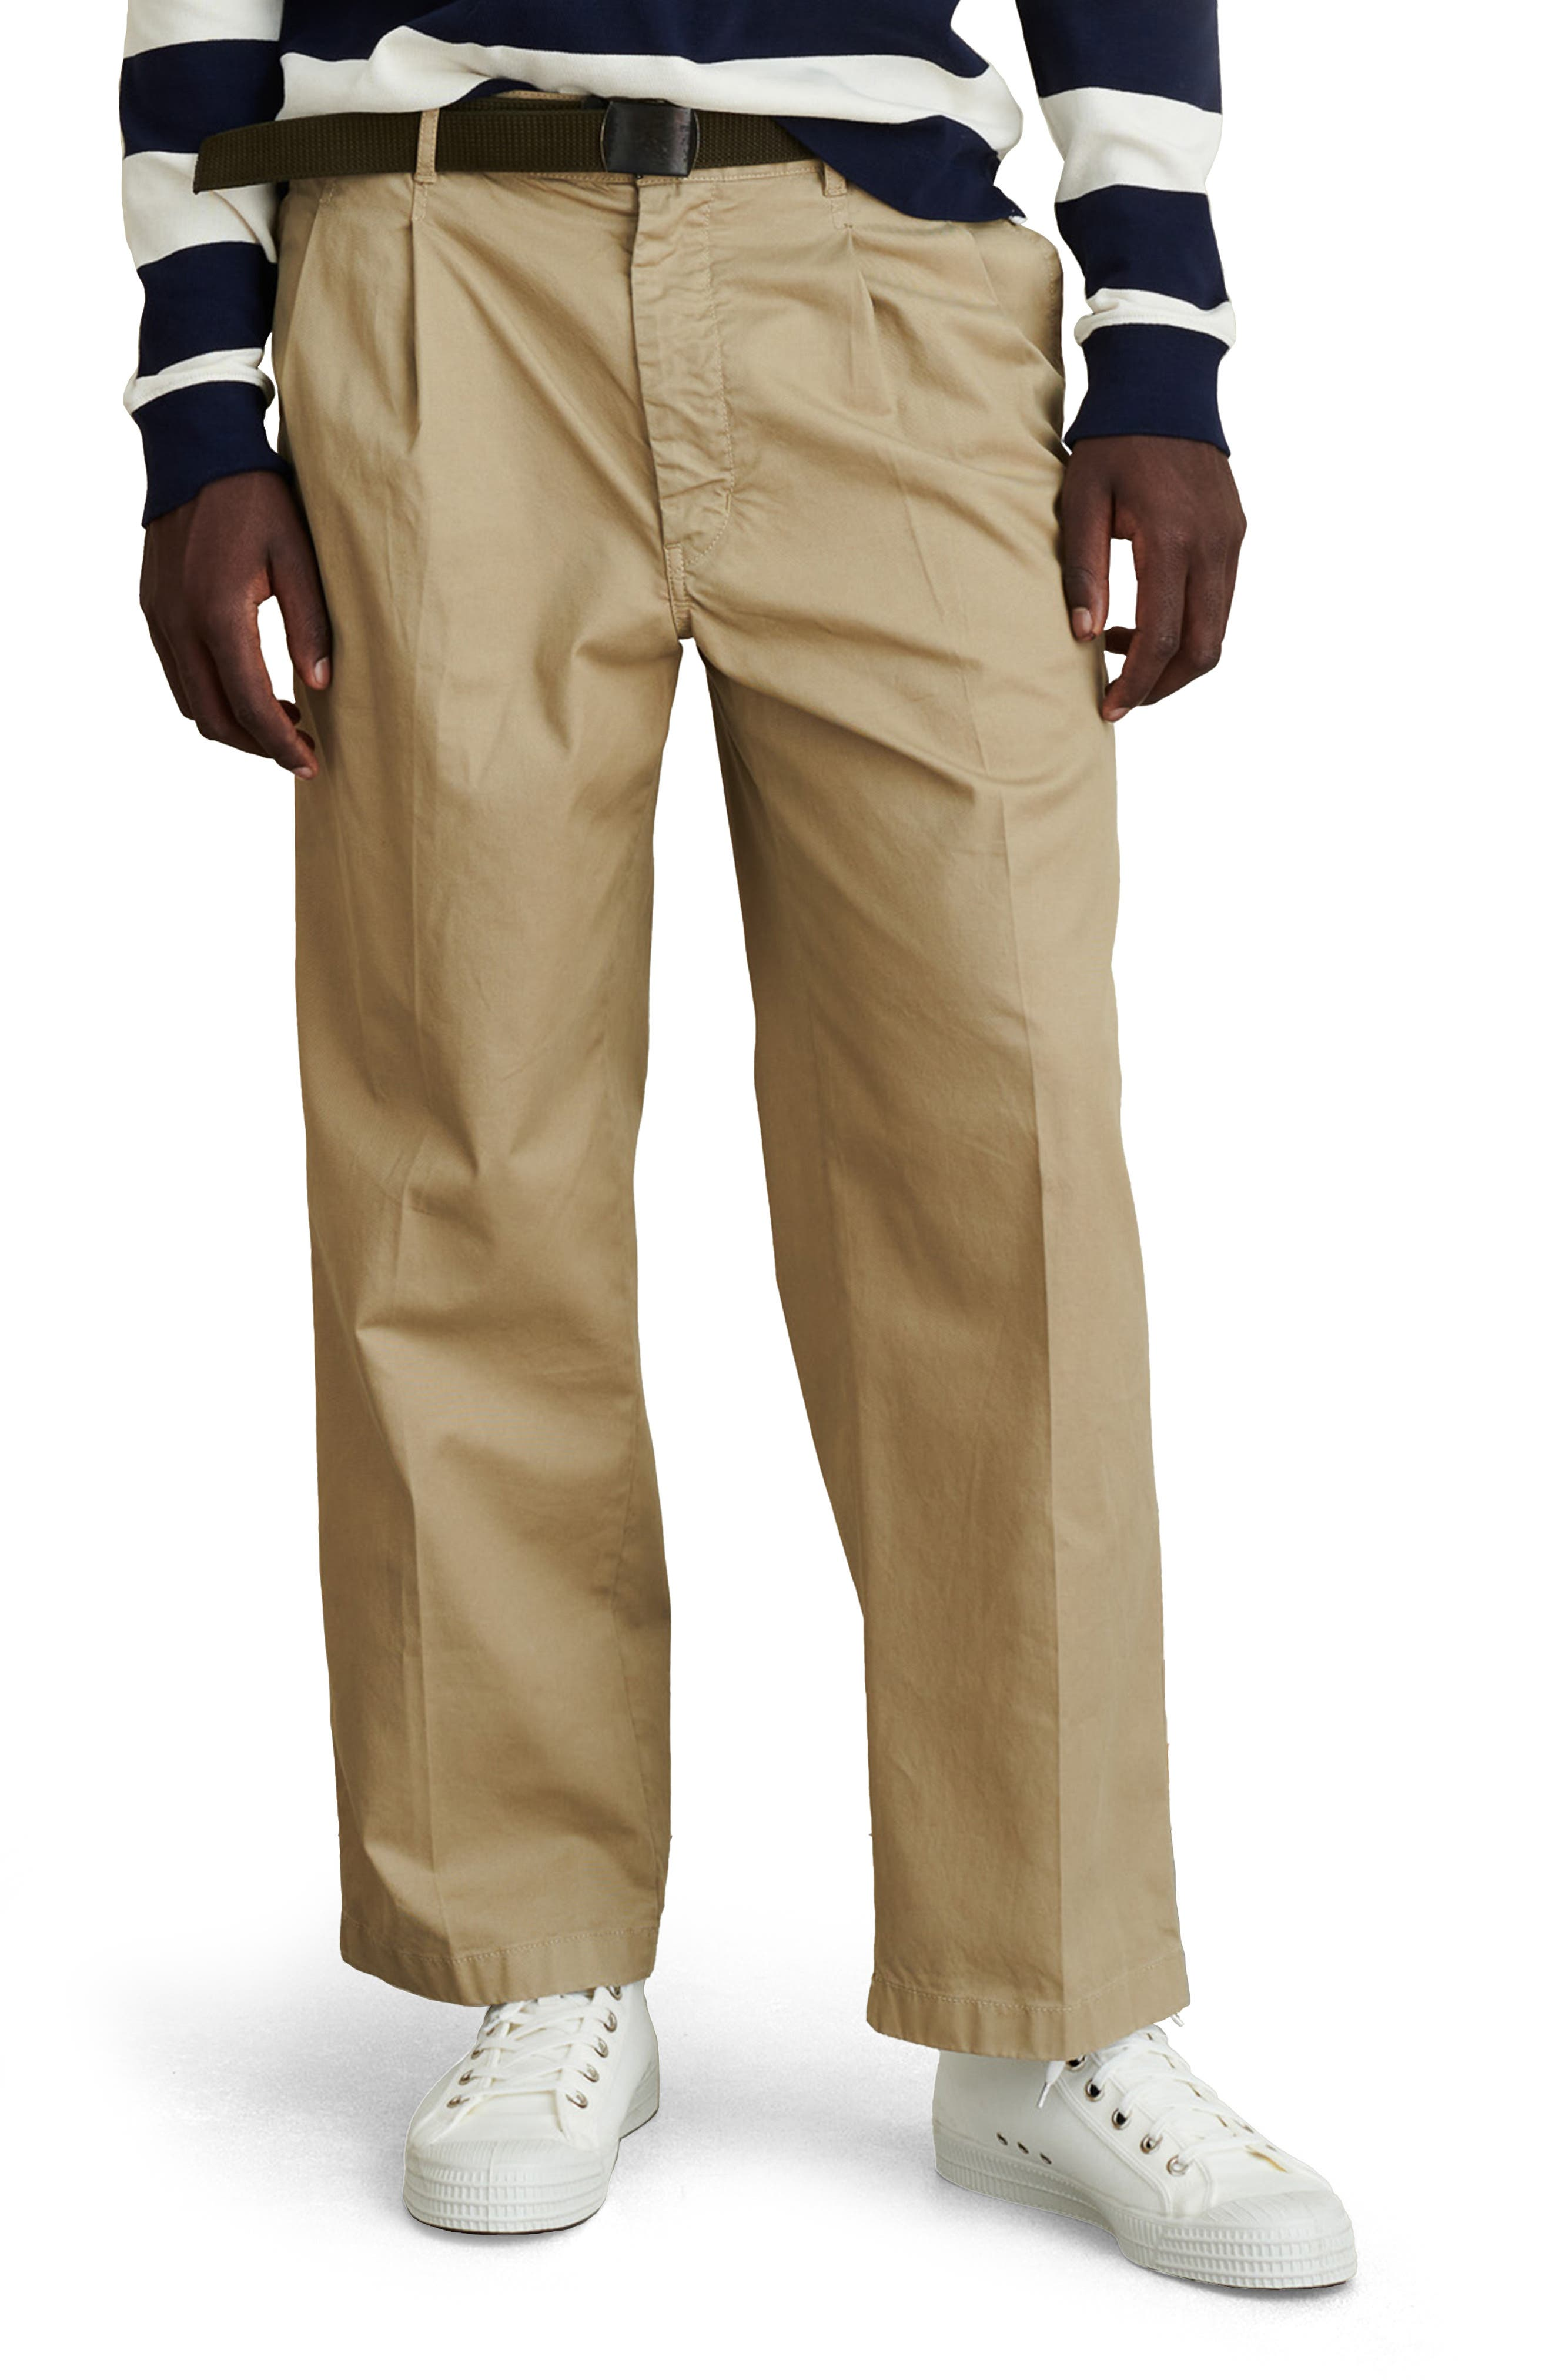 Standard Pleated Straight Leg Chinos